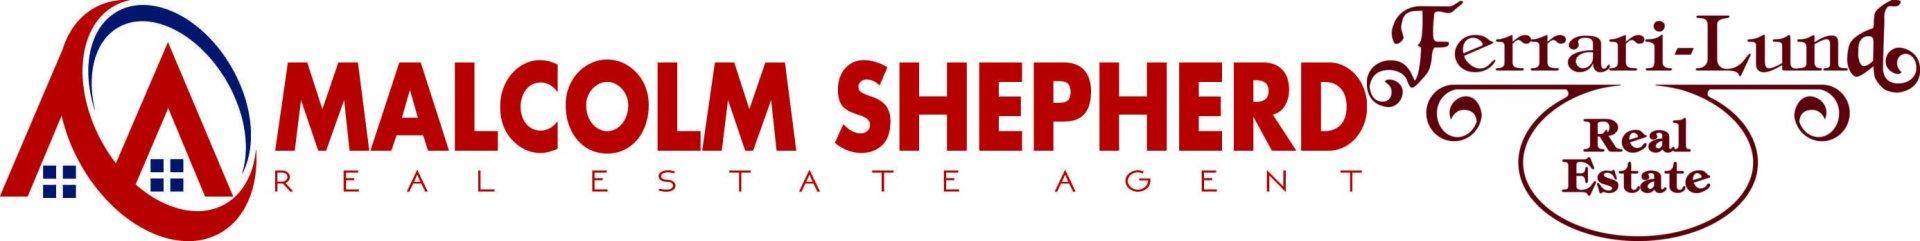 Malcolm Shepherd  logo